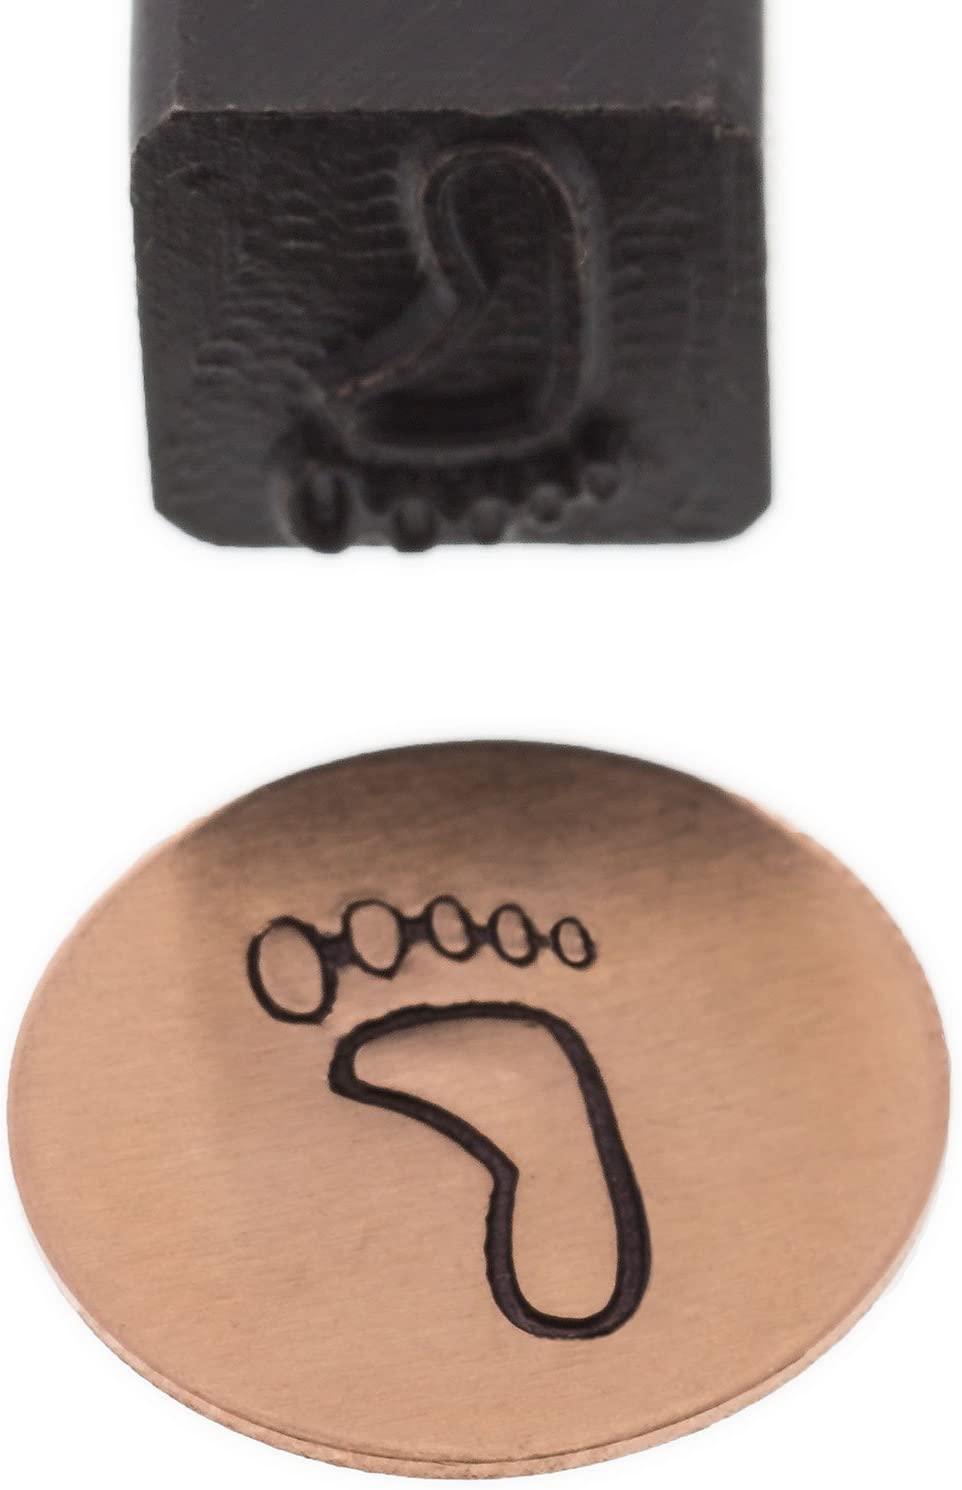 Elite Jumbo Design Stamp, 10 Millimeters, Right Foot | PUN-225.21